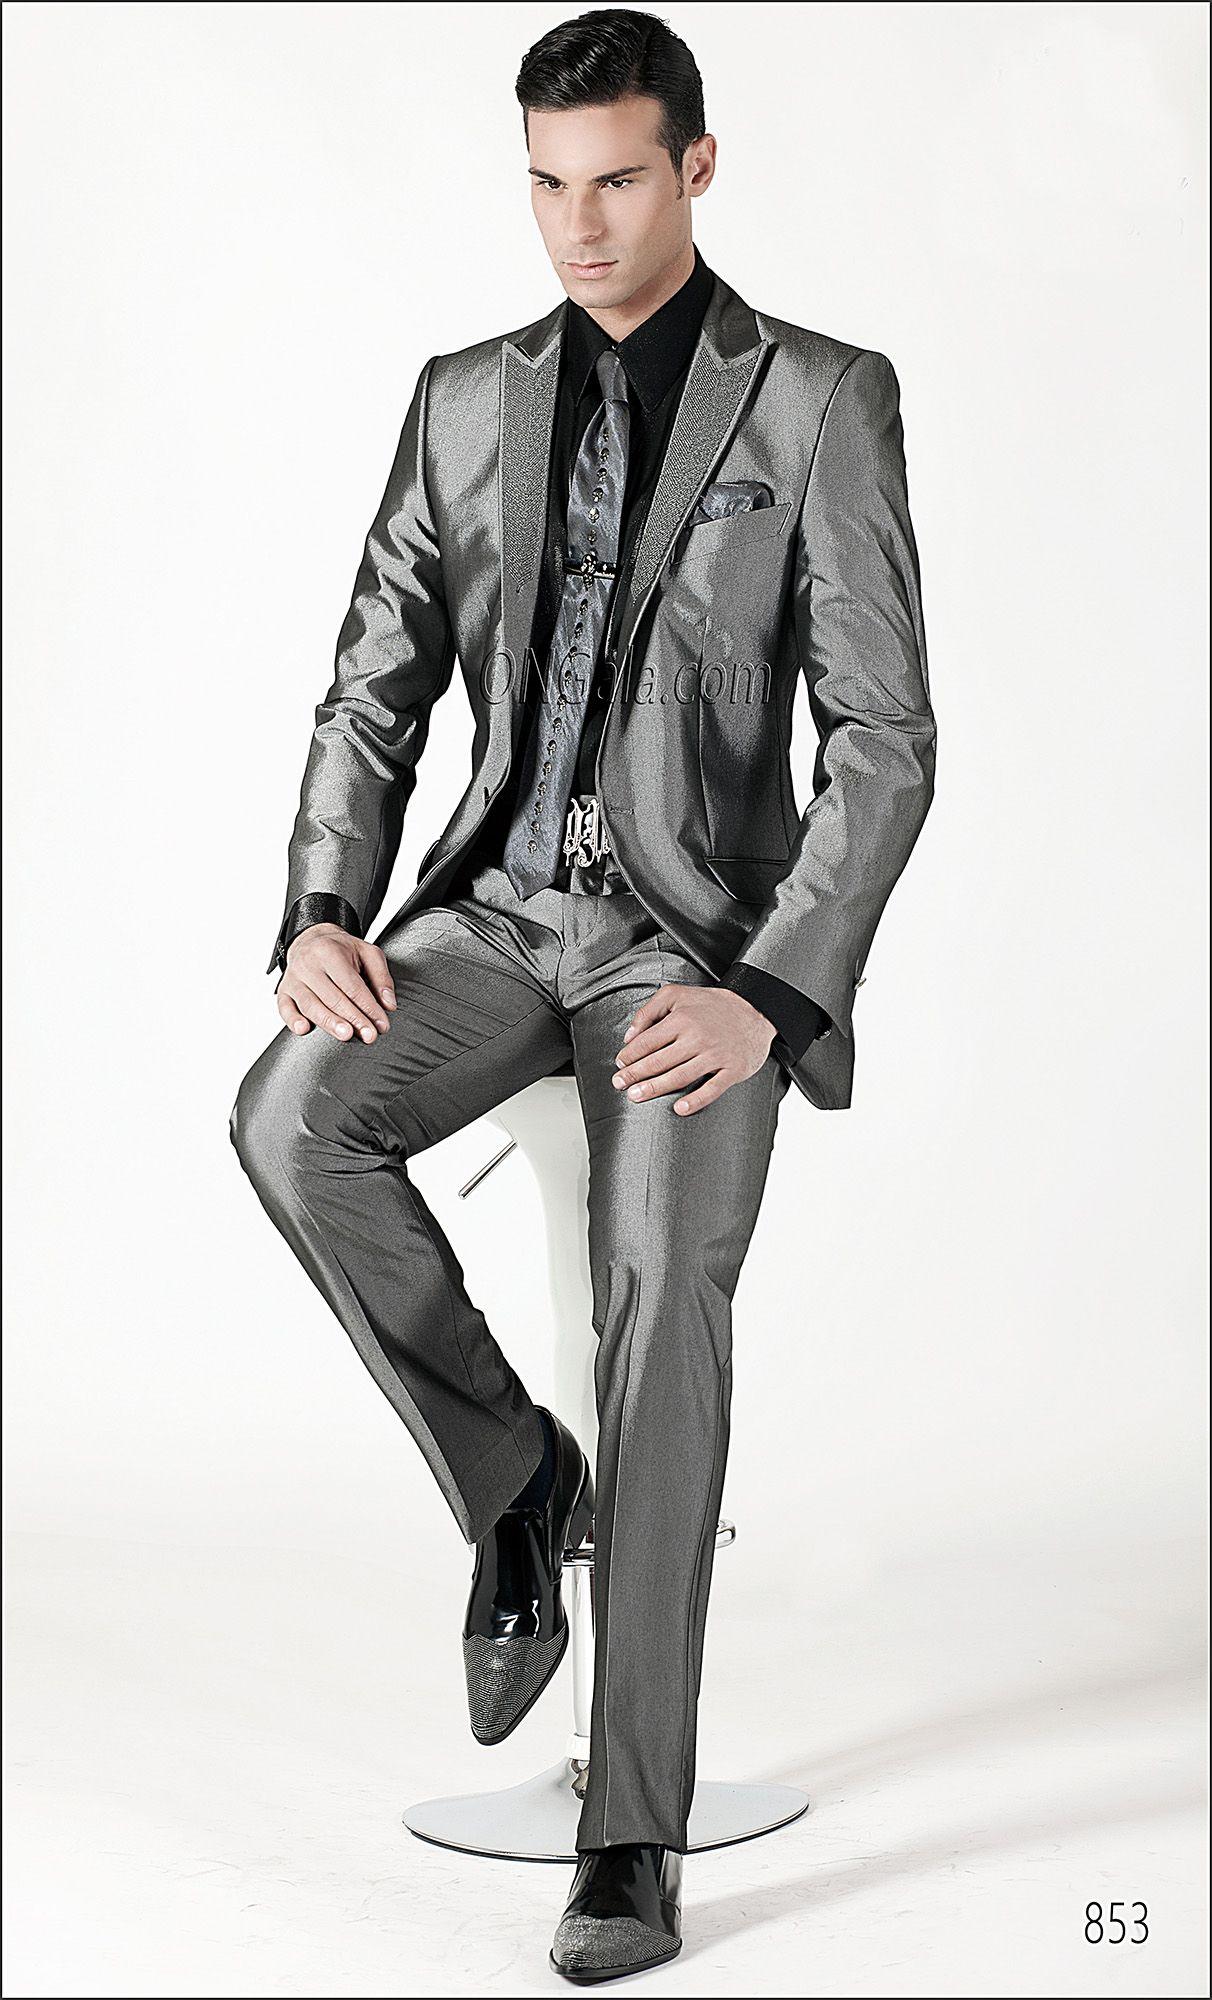 Abito Matrimonio Uomo Grigio : Abito da cerimonia uomo ricamato grigio antracite shiny suit